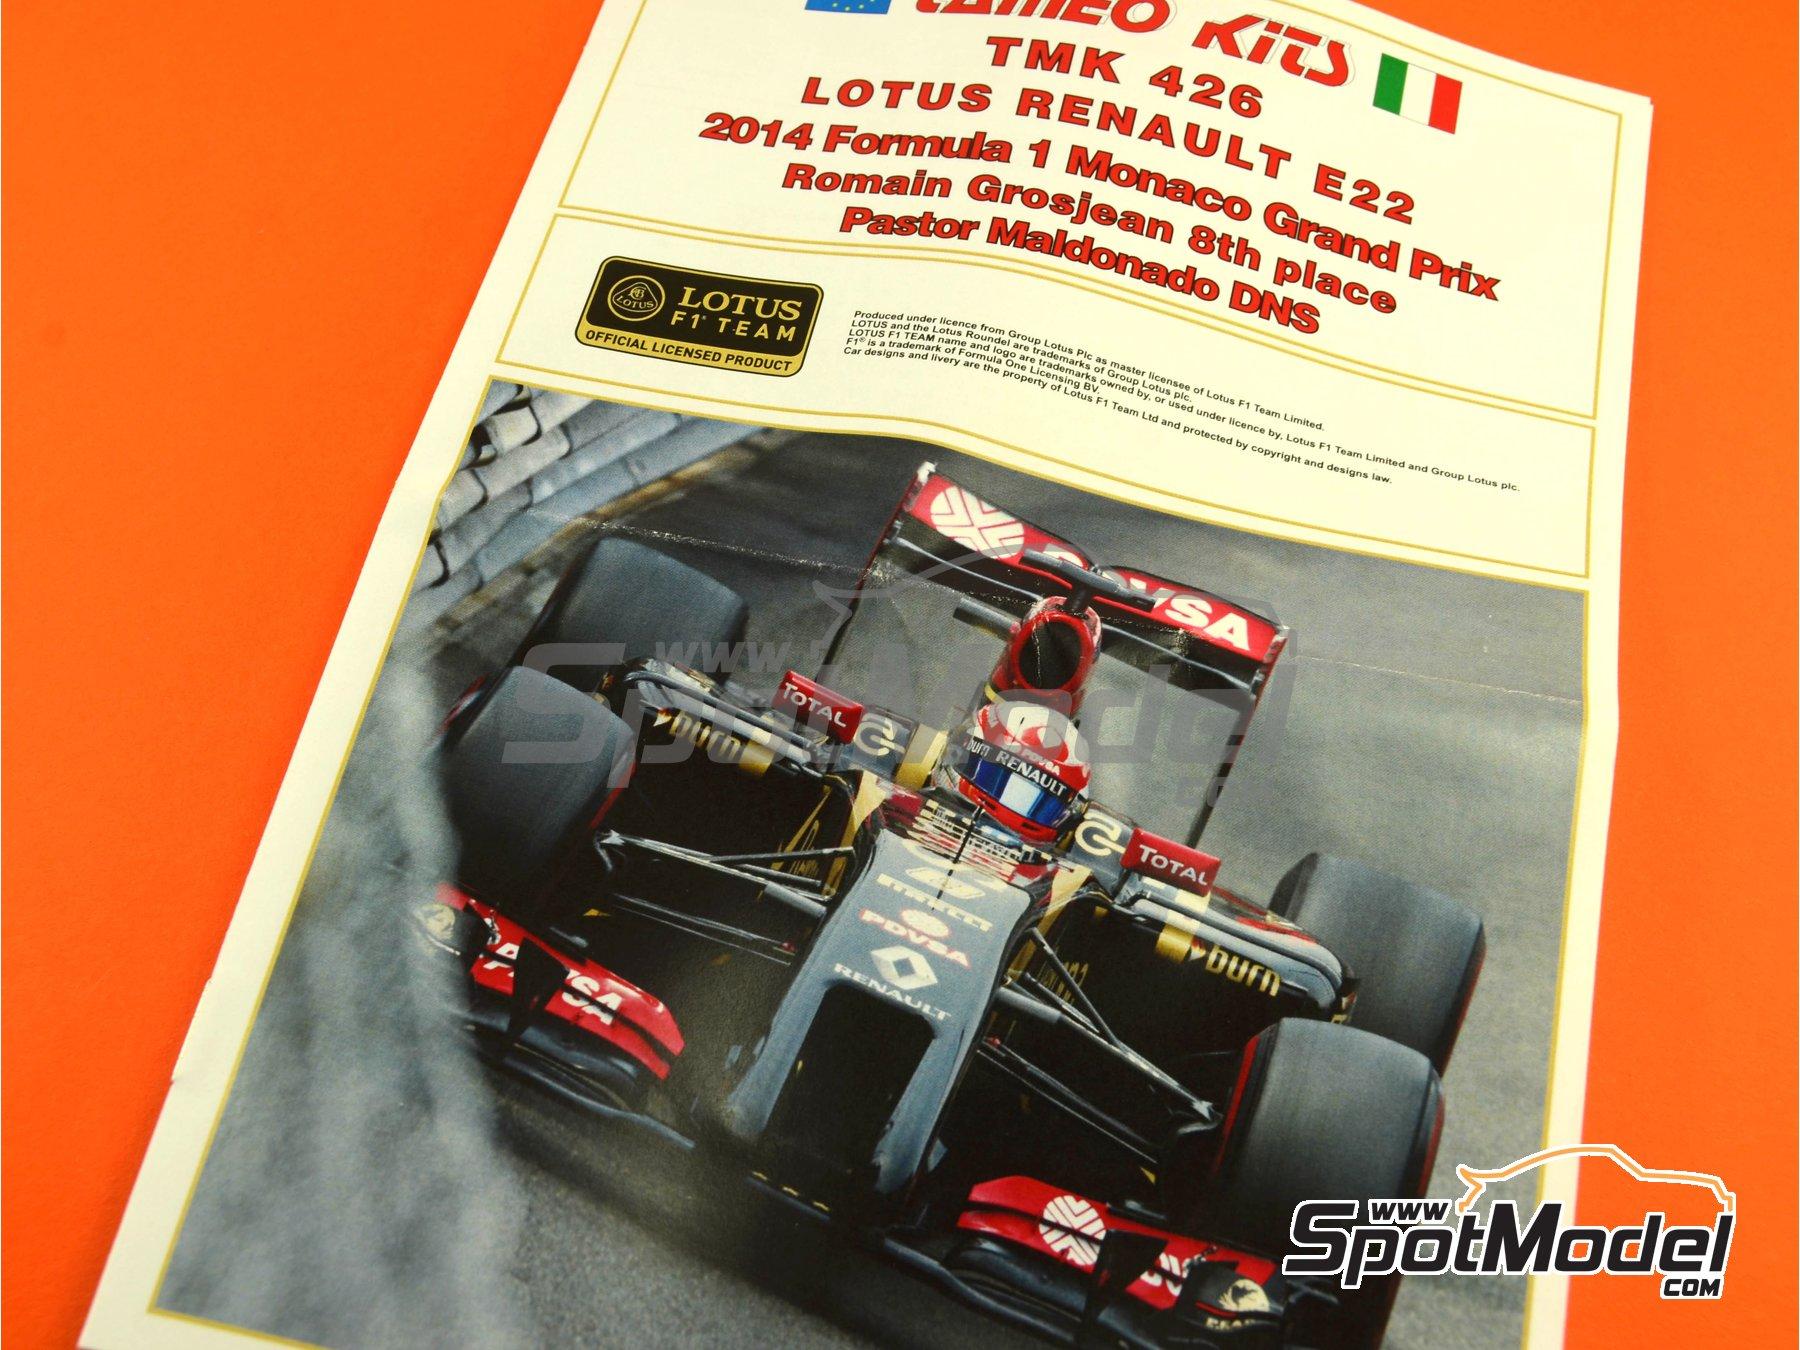 Image 6: Lotus Renault E22 Rexona - Gran Premio de Formula 1 de Mónaco 2014 | Maqueta de coche en escala1/43 fabricado por Tameo Kits (ref.TMK426)